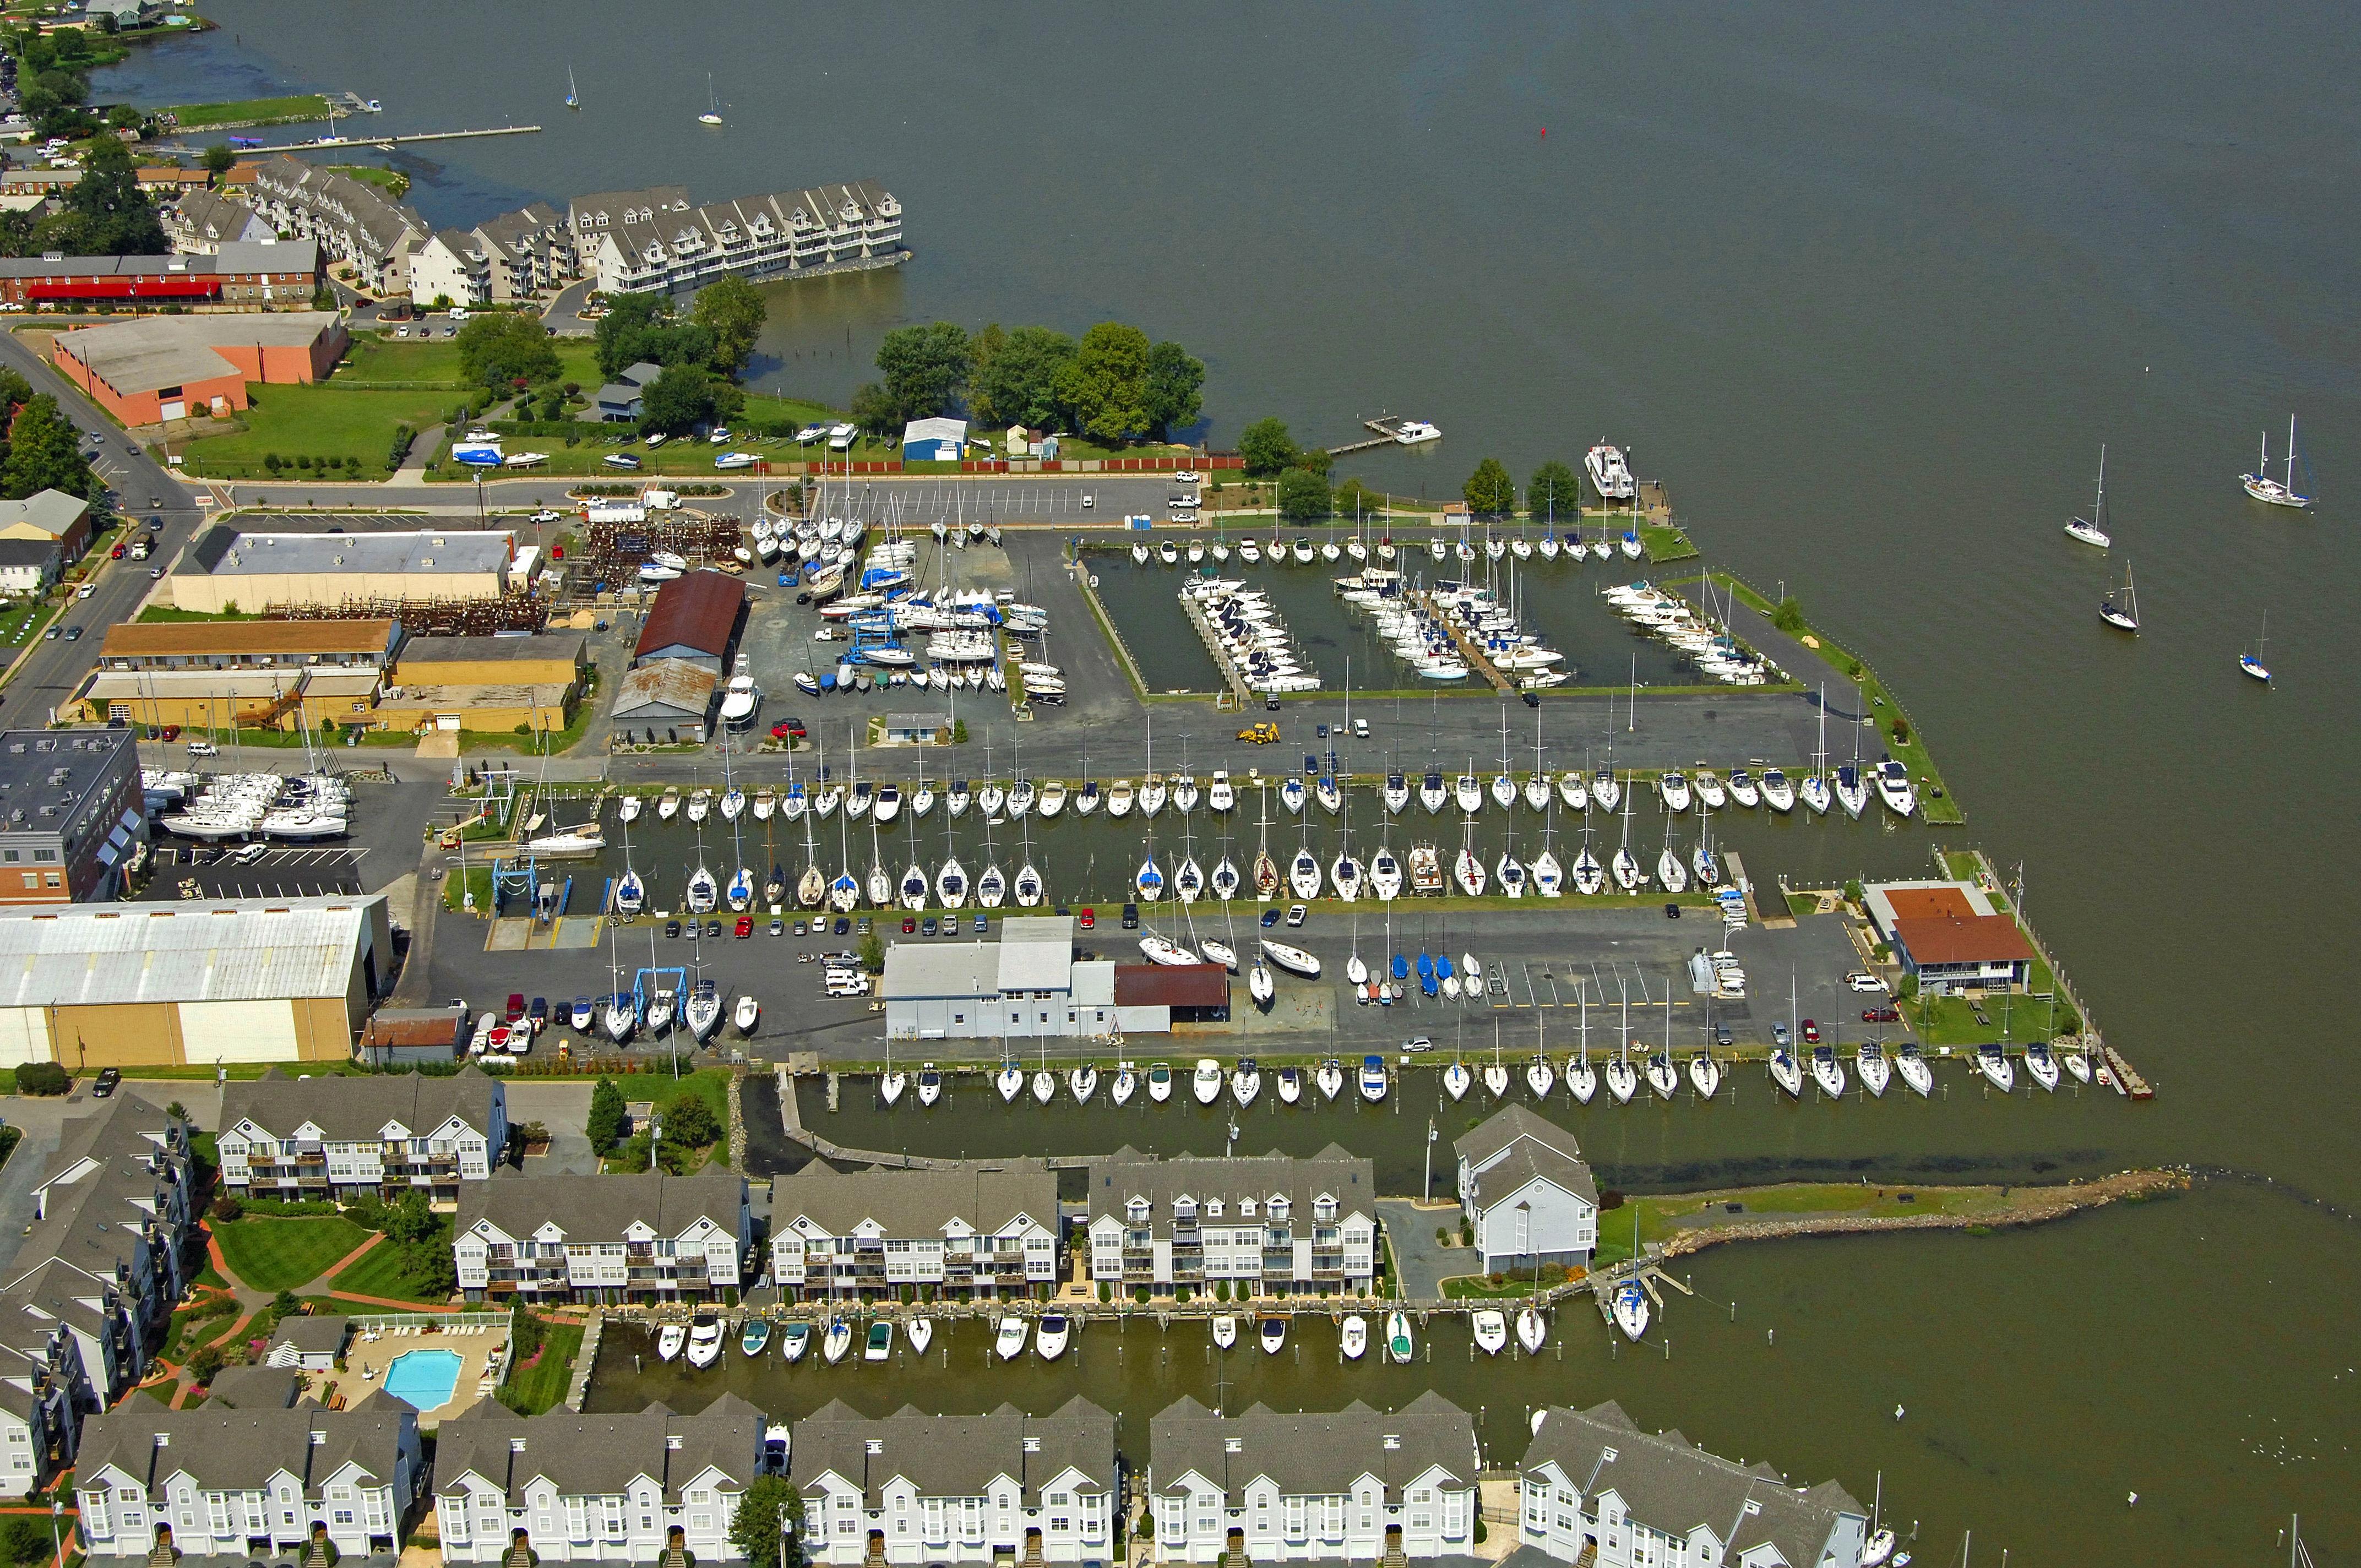 Tidewater Marina in Havre de Grace, MD, United States